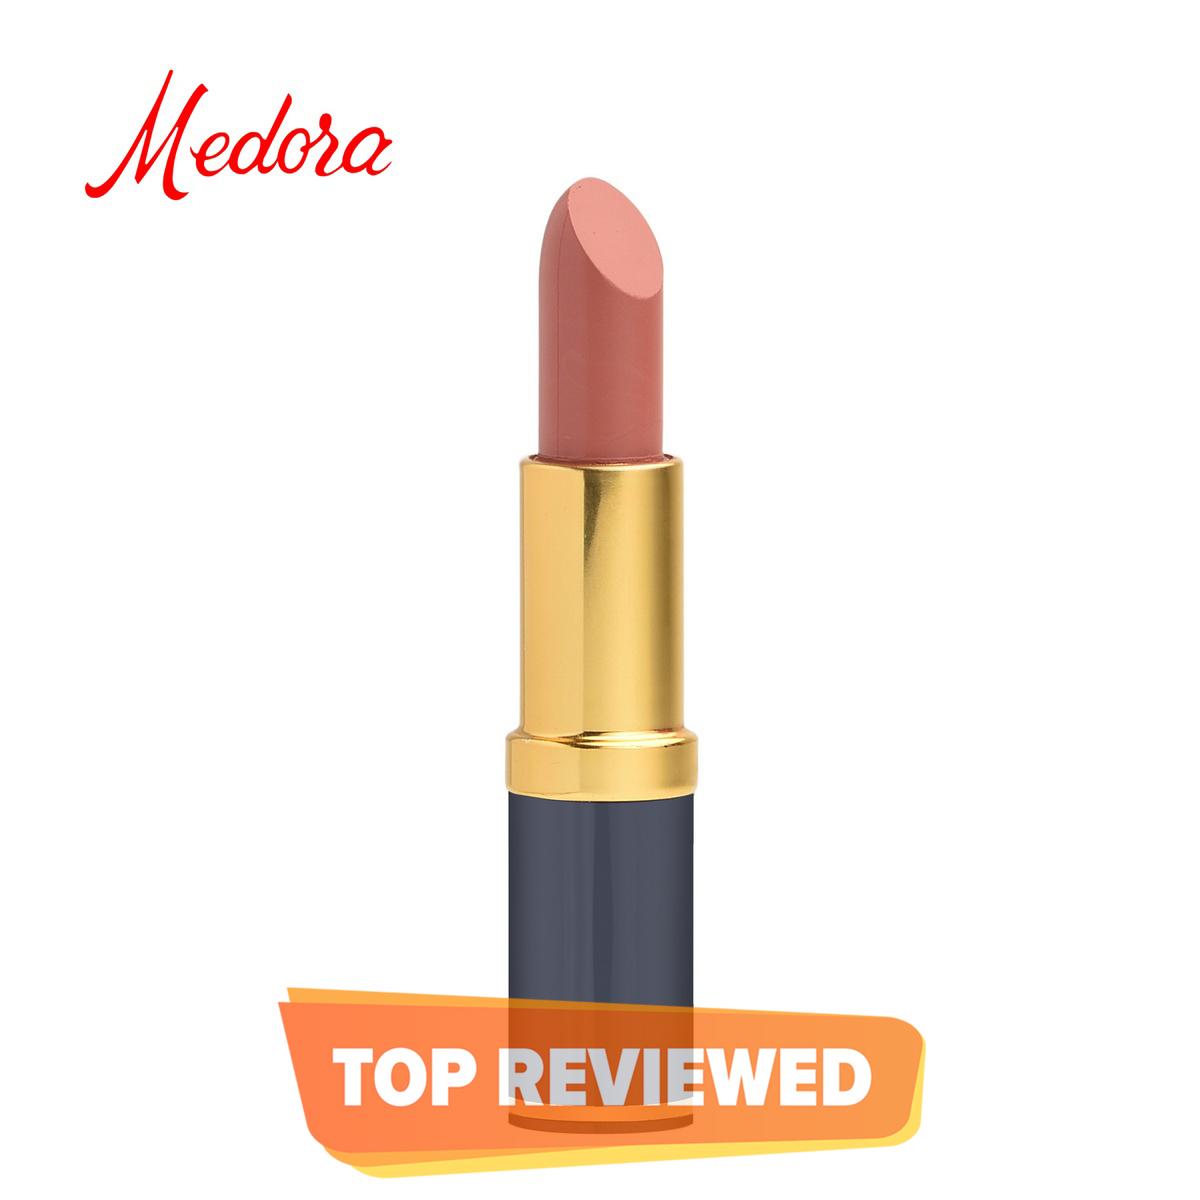 MEDORA Matte Lipstick- 561 DEMURE